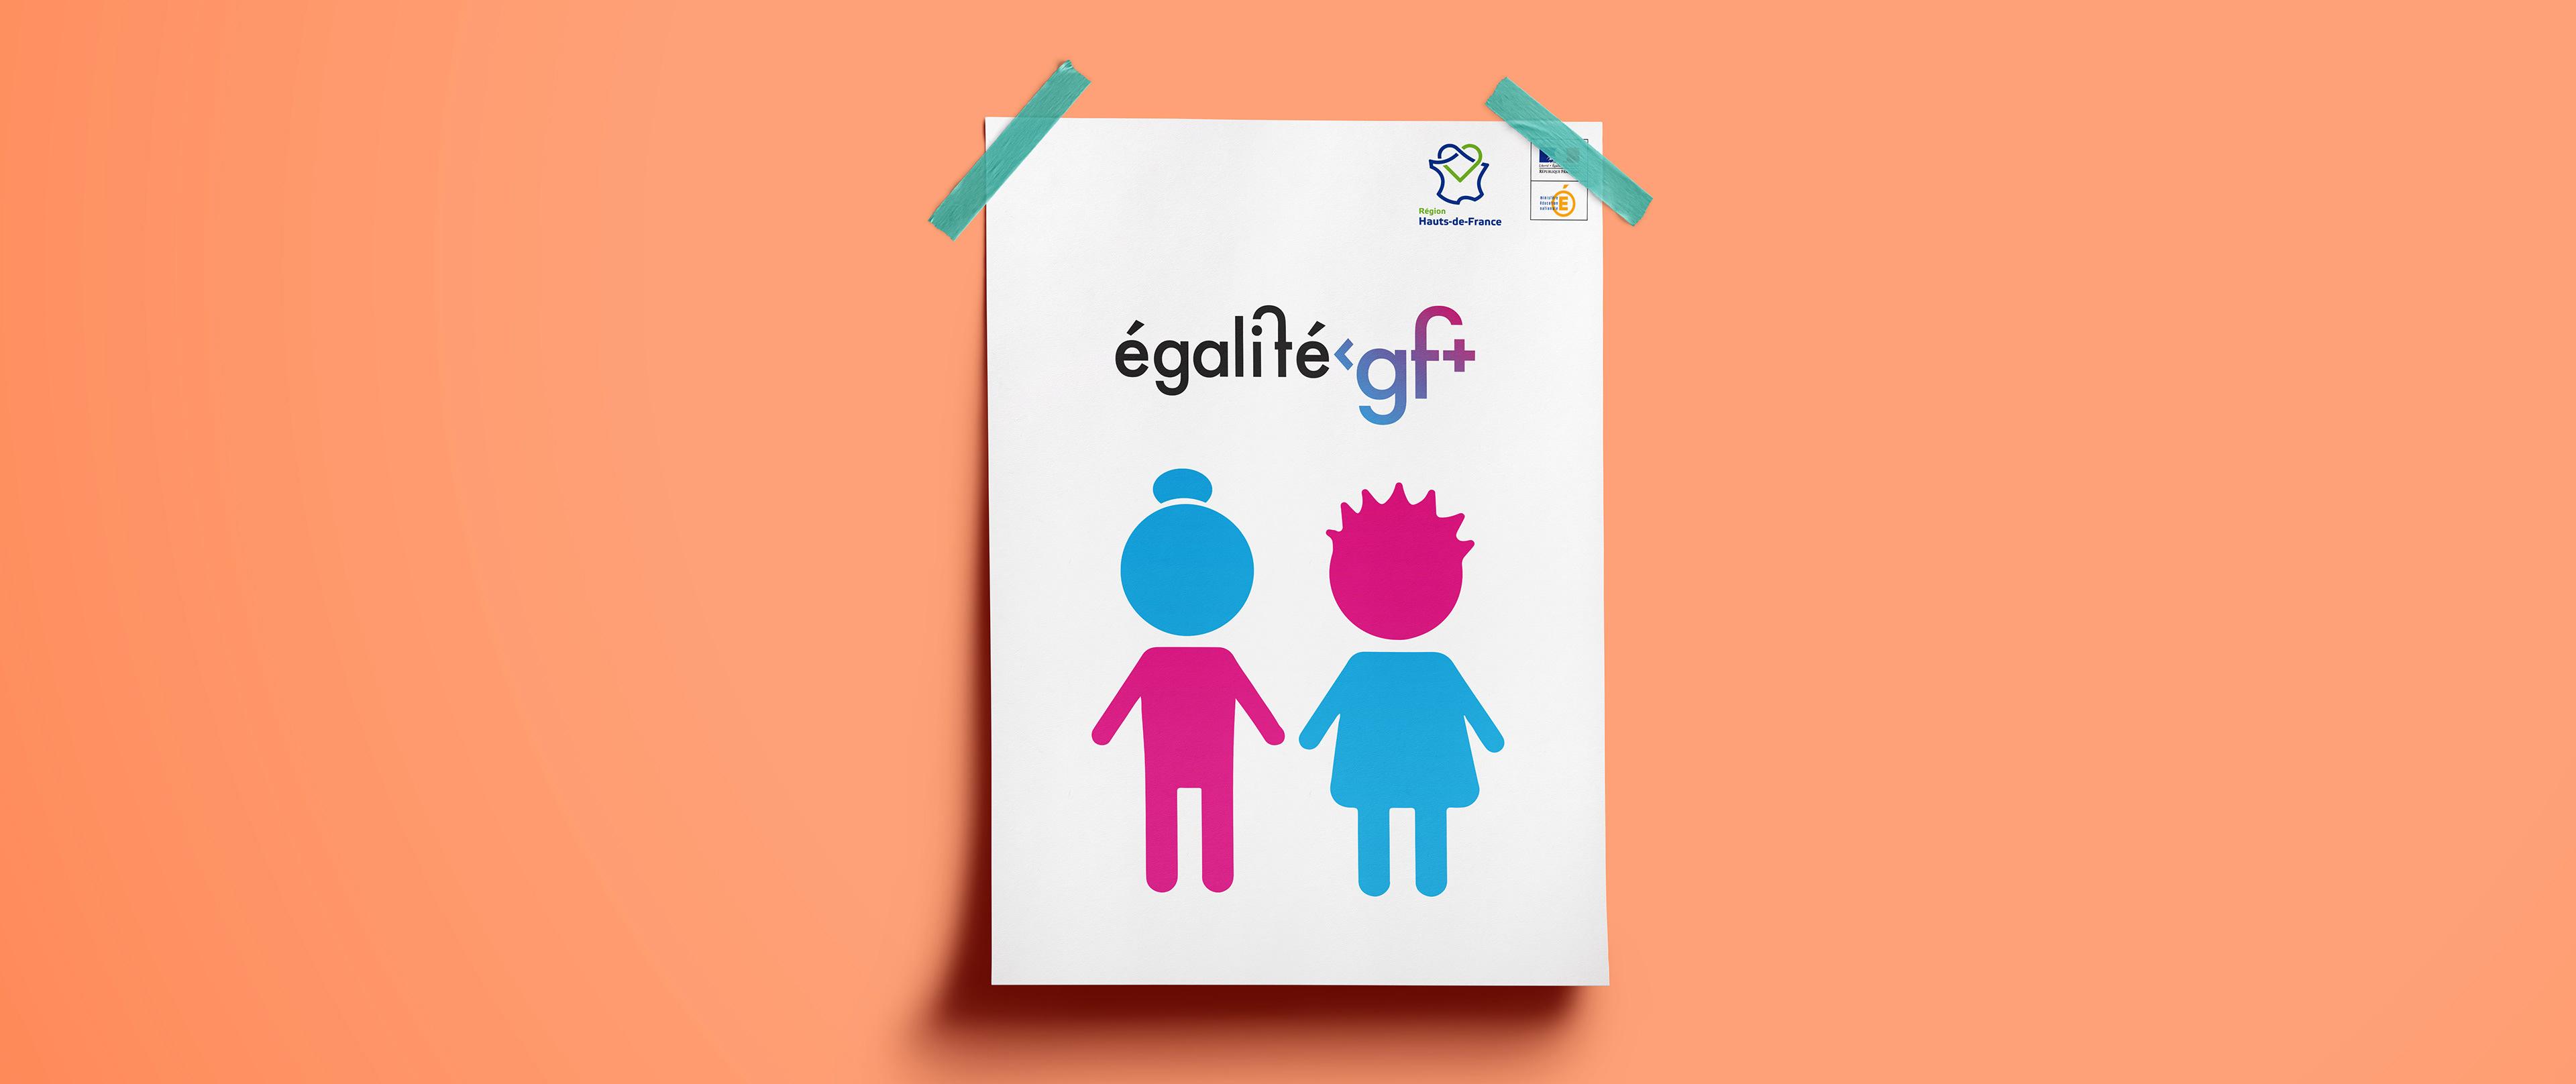 equality between boy and girl